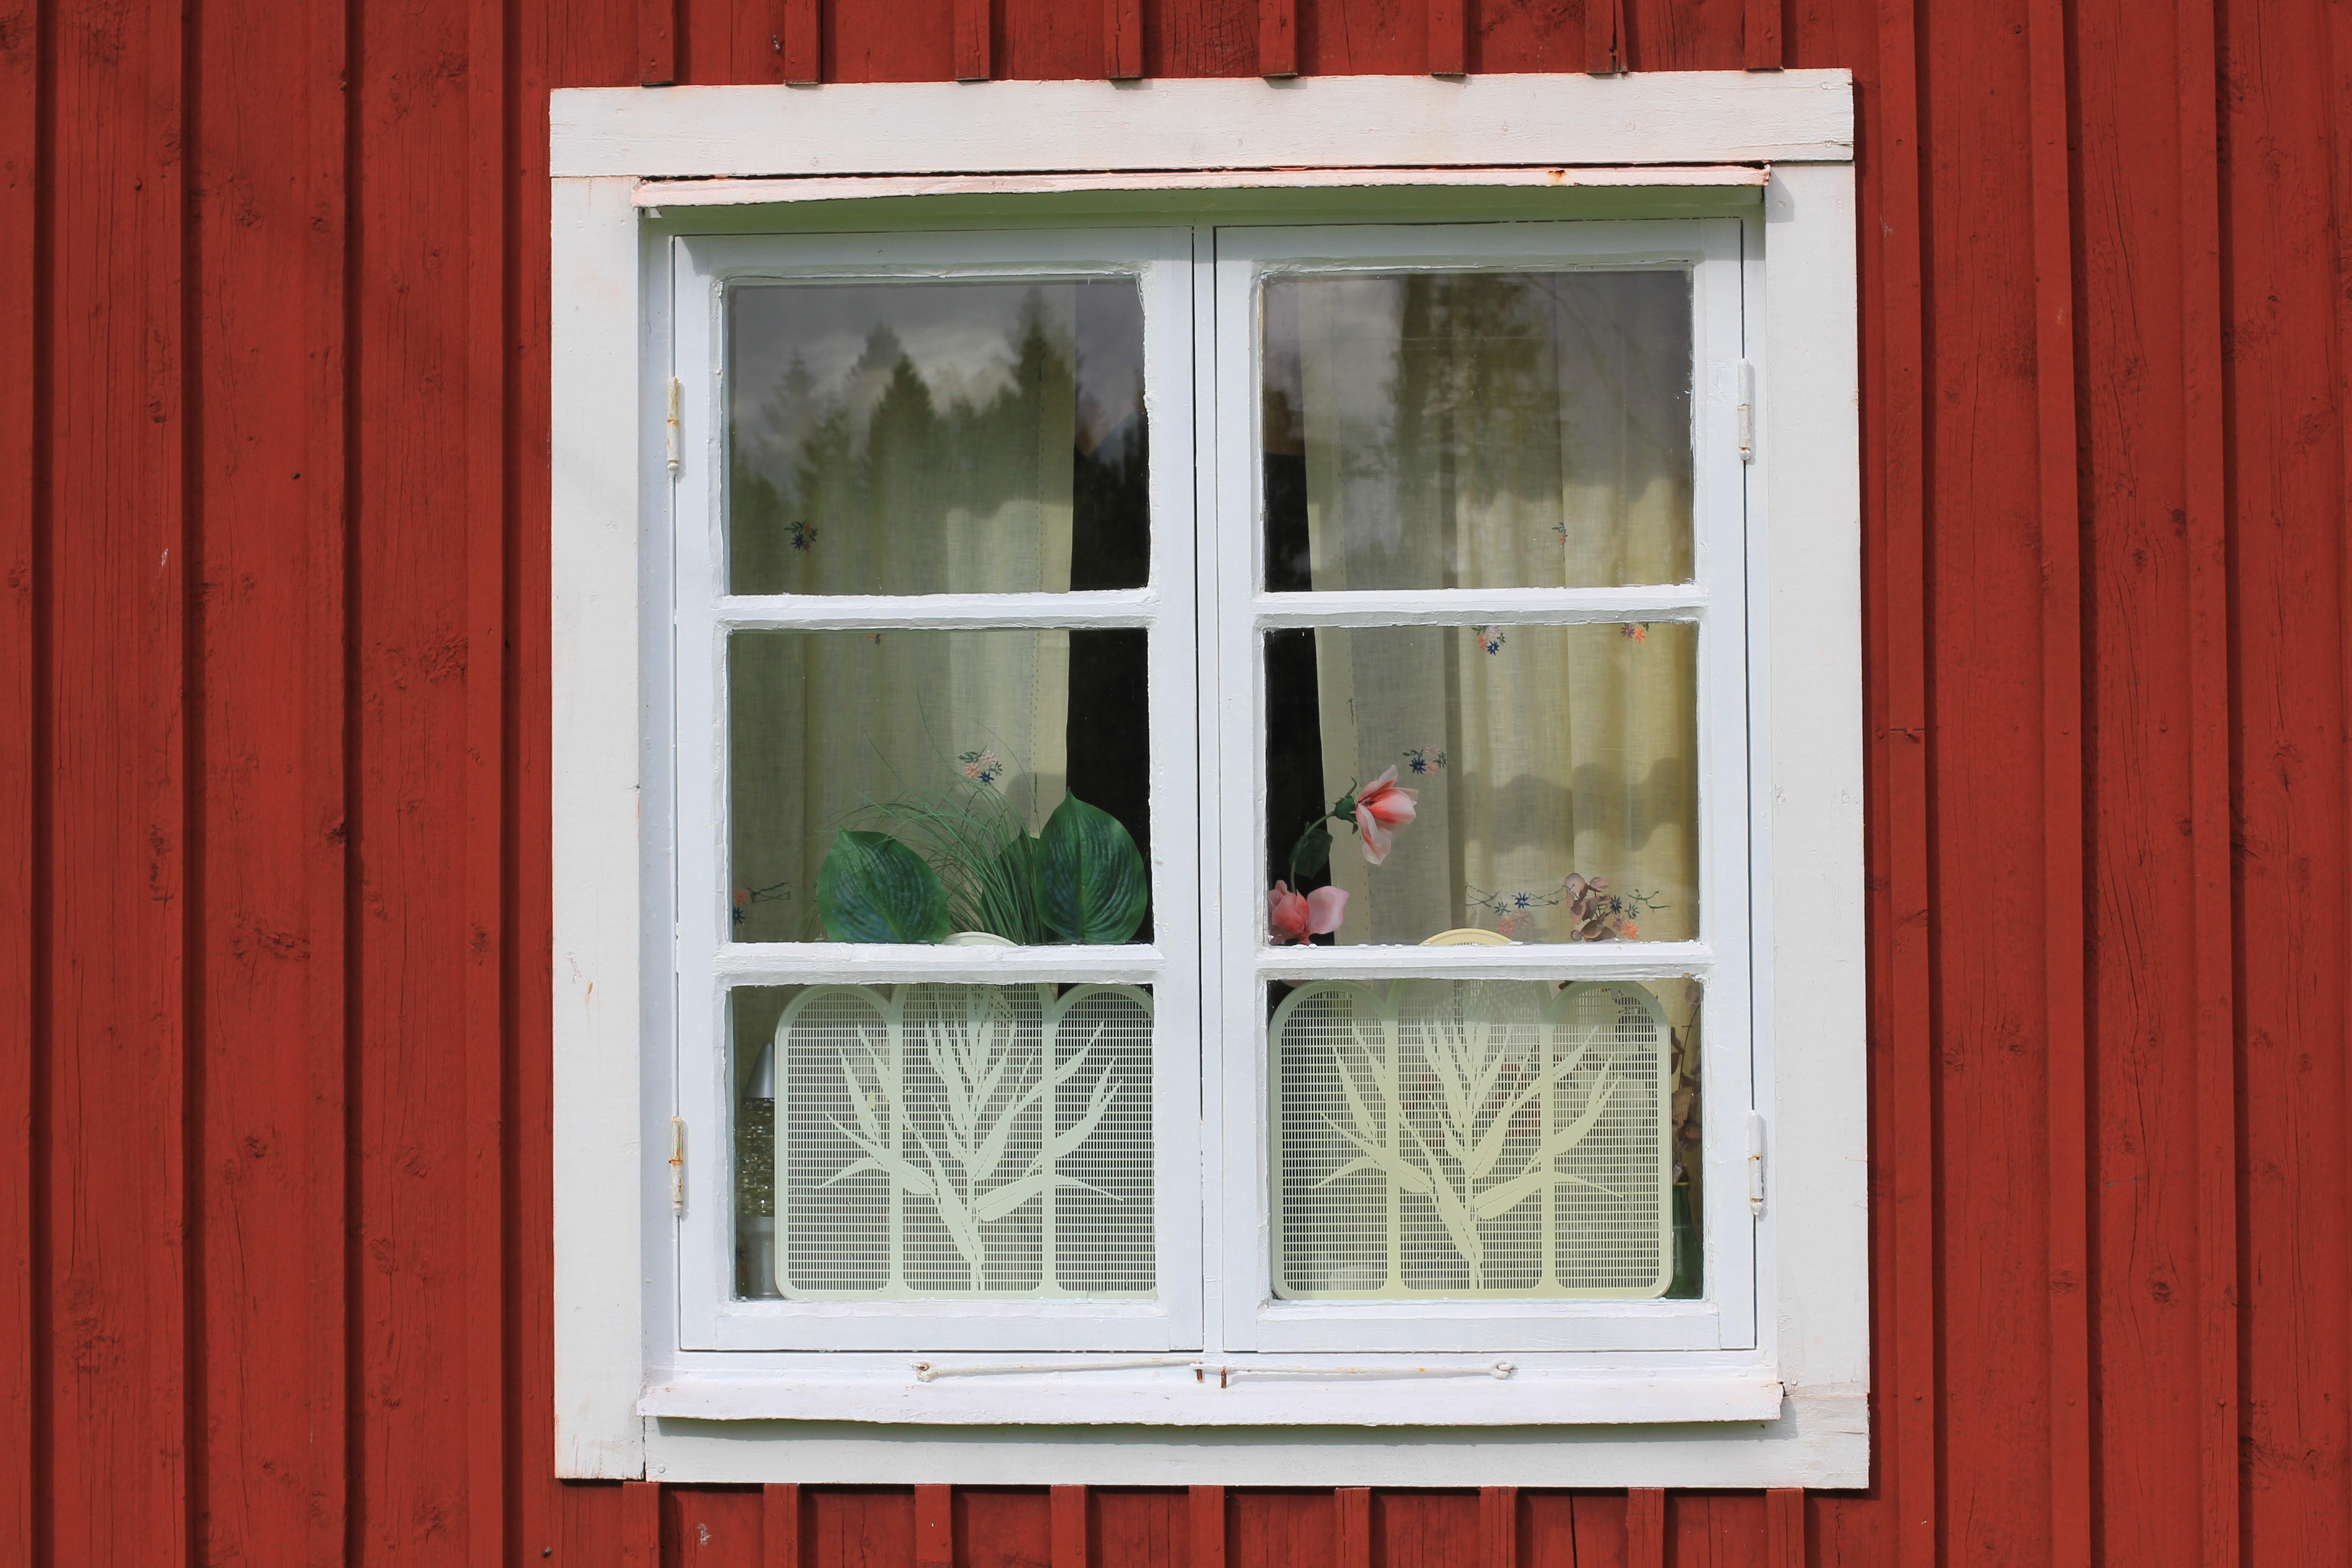 Välkända File:Gammelt vindu på ei stue malt i Falu Rödfärg.JPG - Wikimedia KR-09